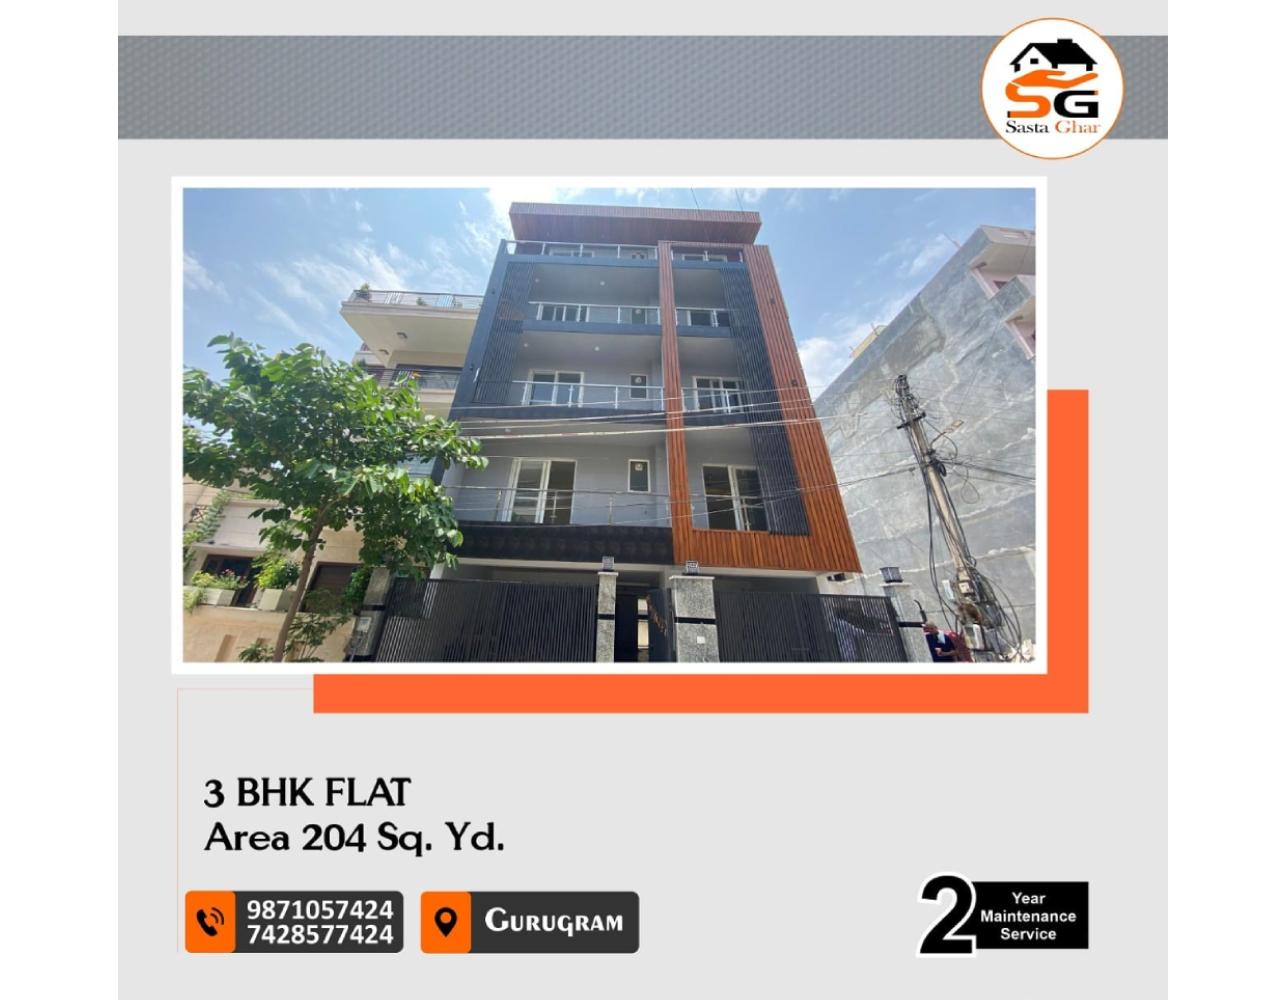 3 BHK flat In Gurugram Sector 55 Image